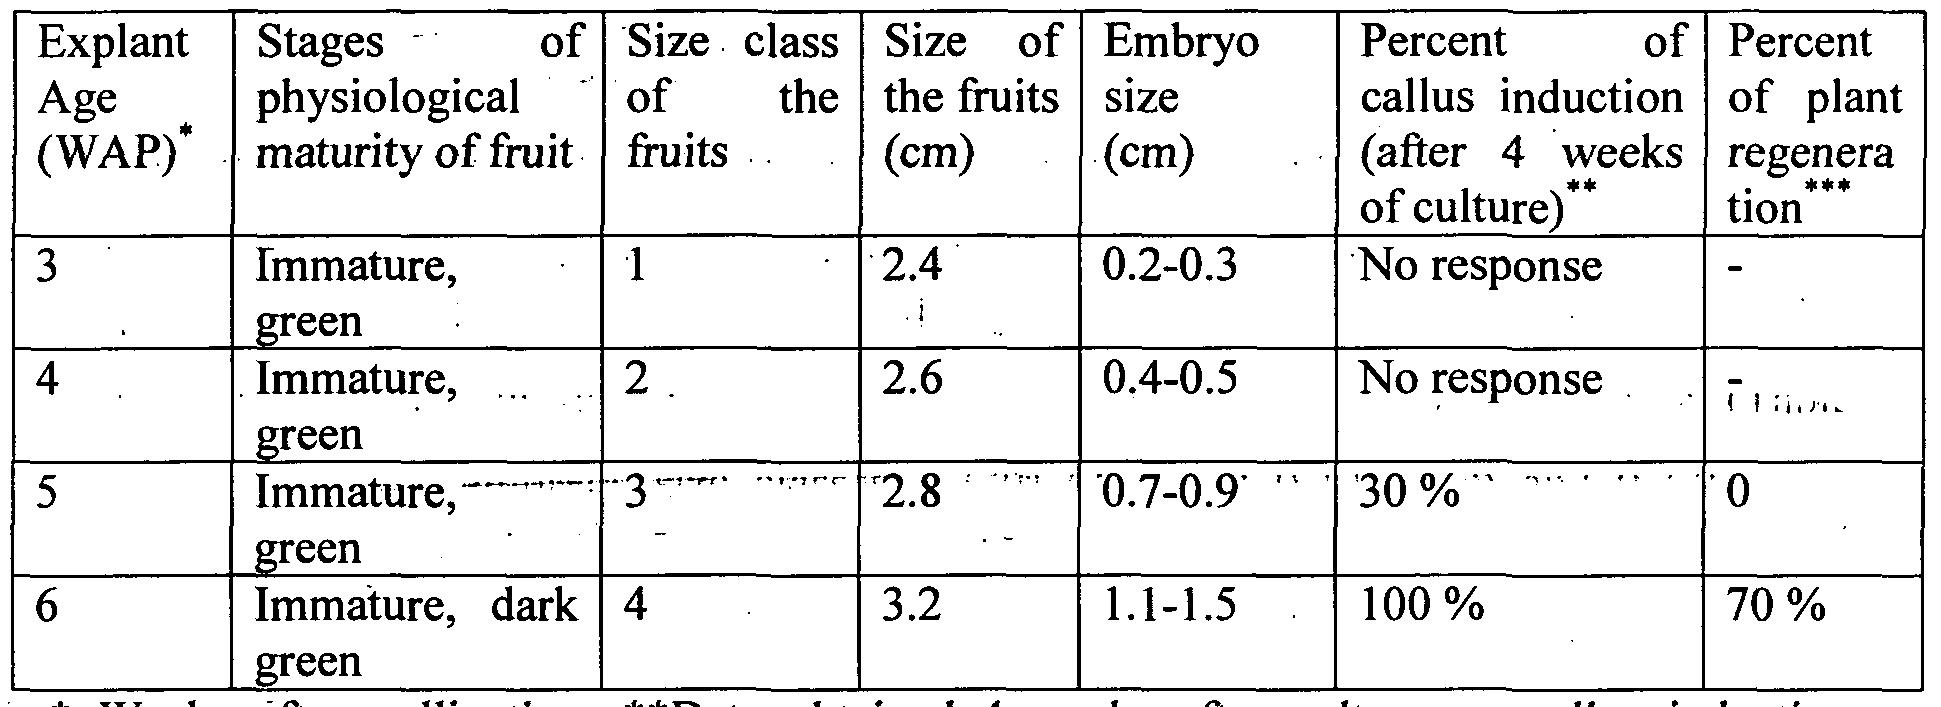 in vitro regeneration of jatropha curcas The tissue culture of jatropha always uses ms culture medium as basic  of ba/ iaa-based in vitro regeneration systems for jatropha curcas[j]journal of.